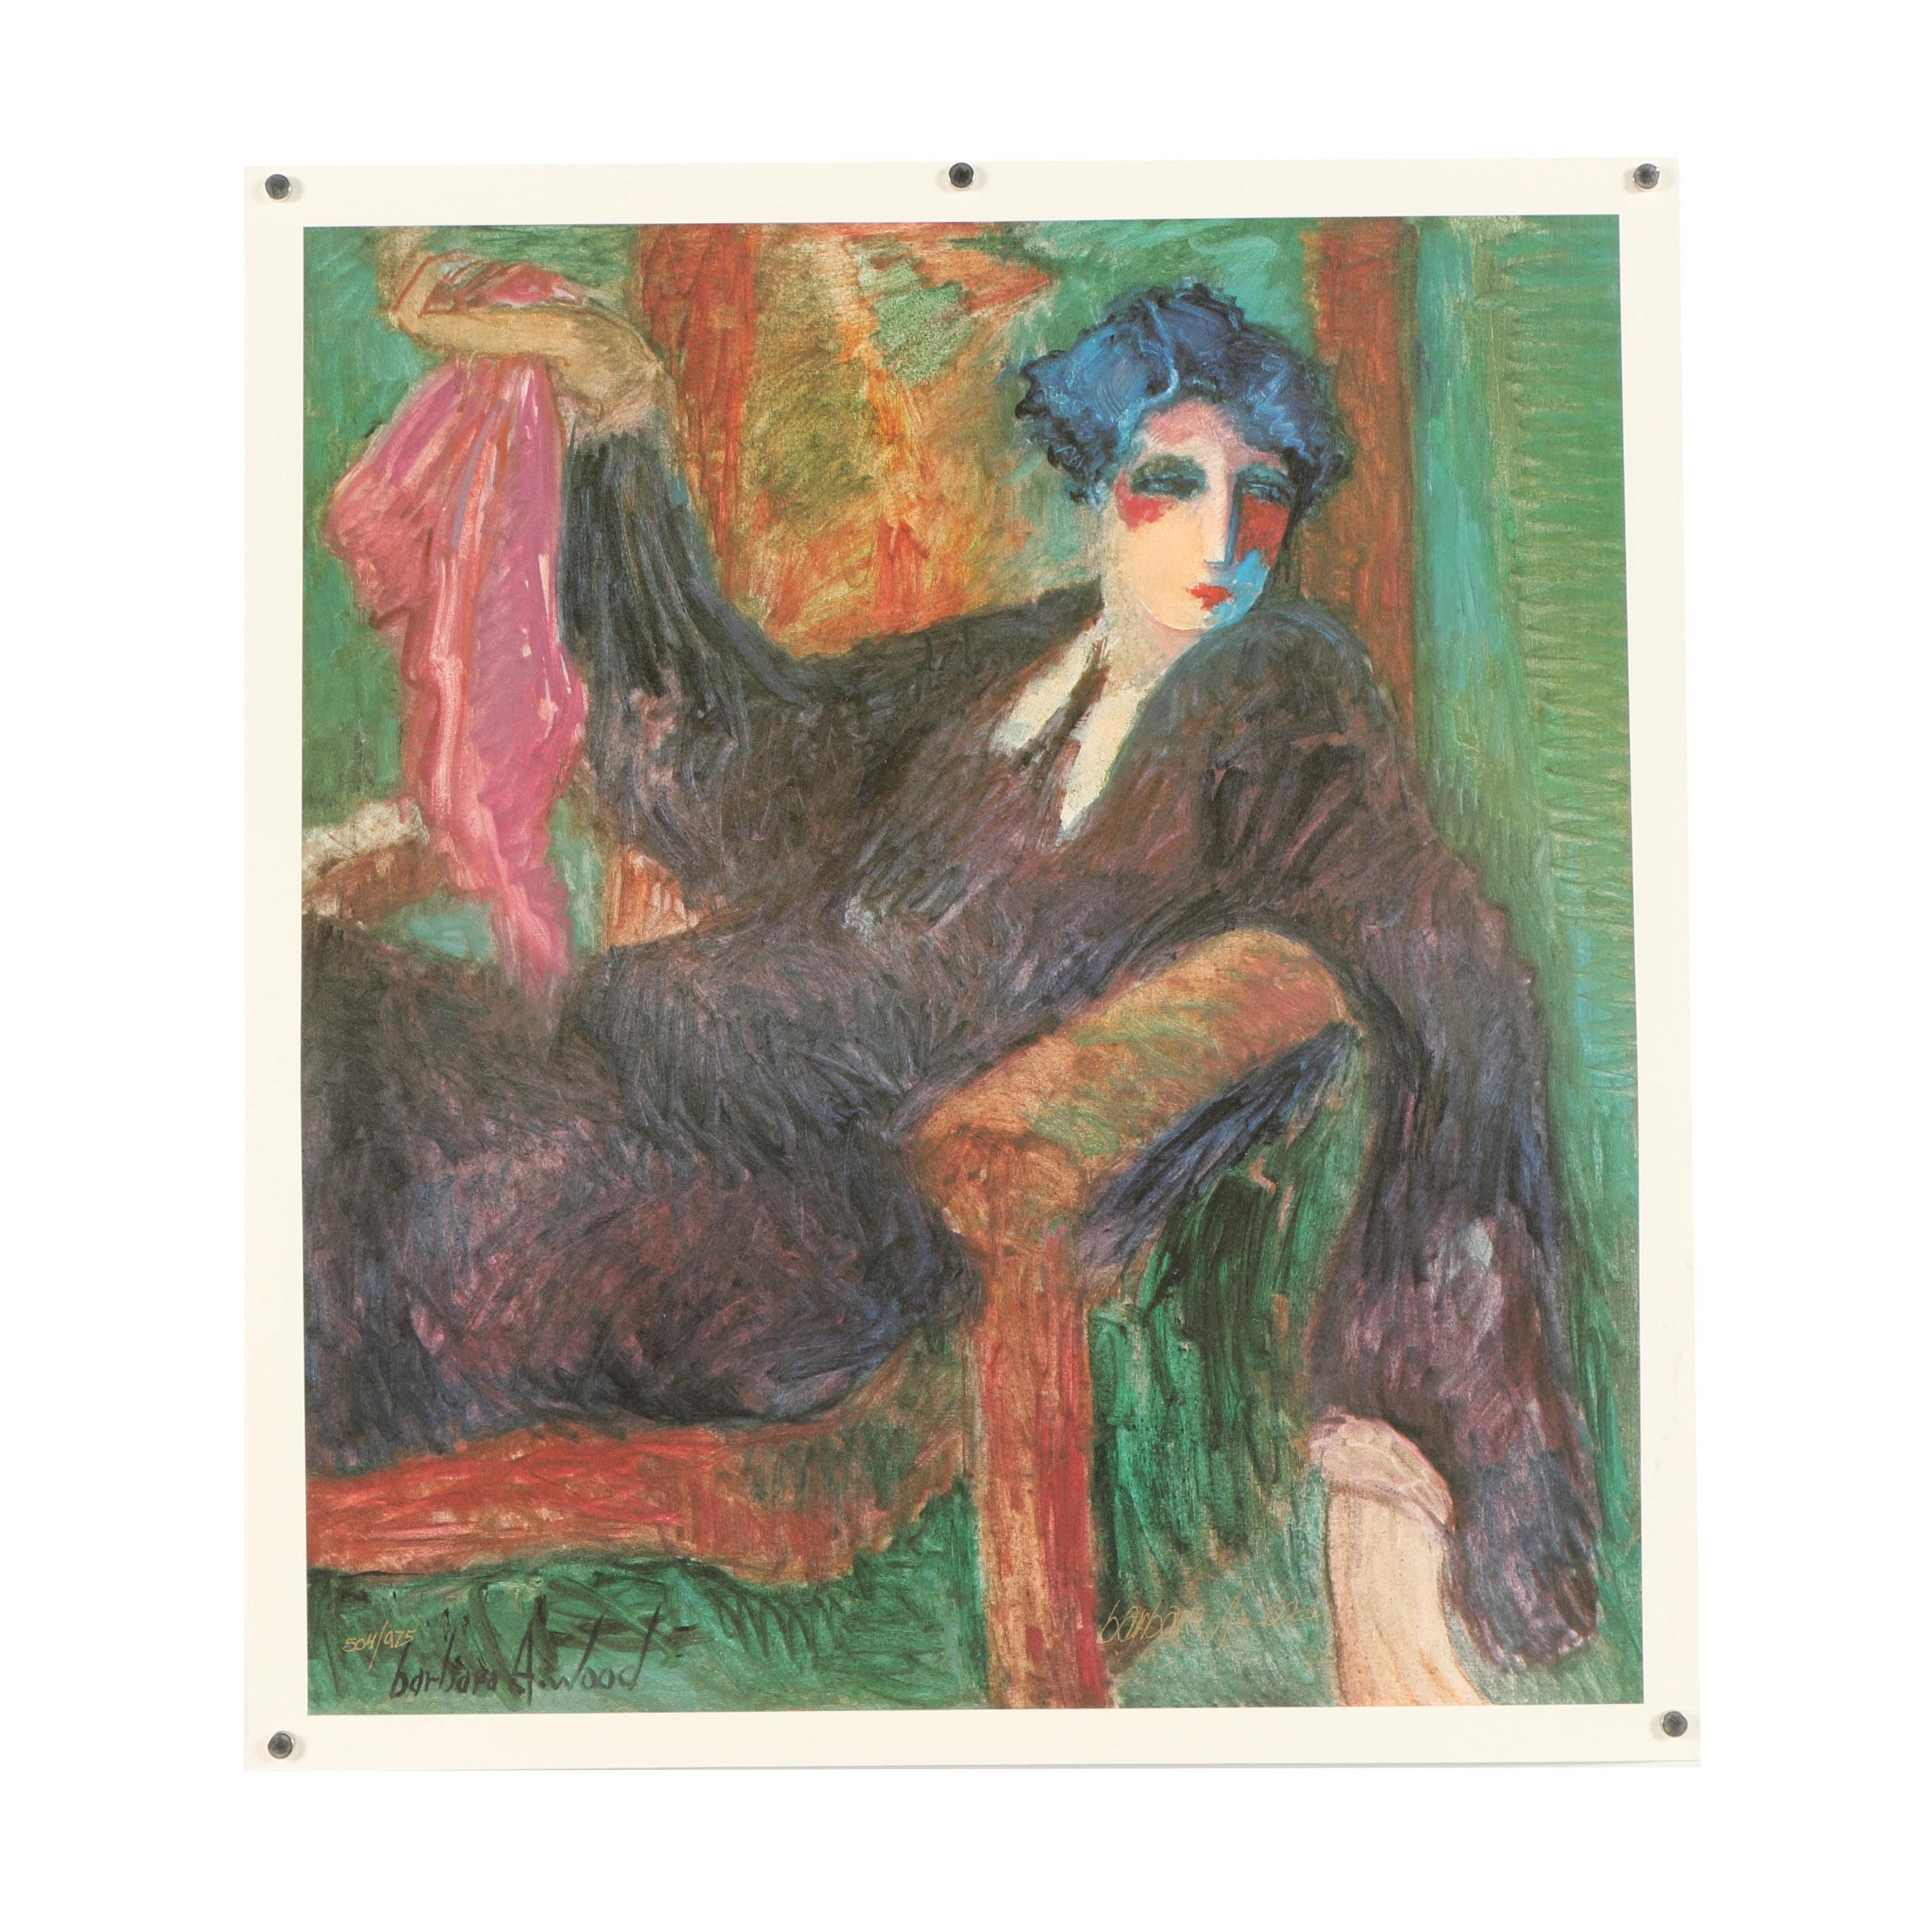 Barbara A. Wood Offset Lithograph